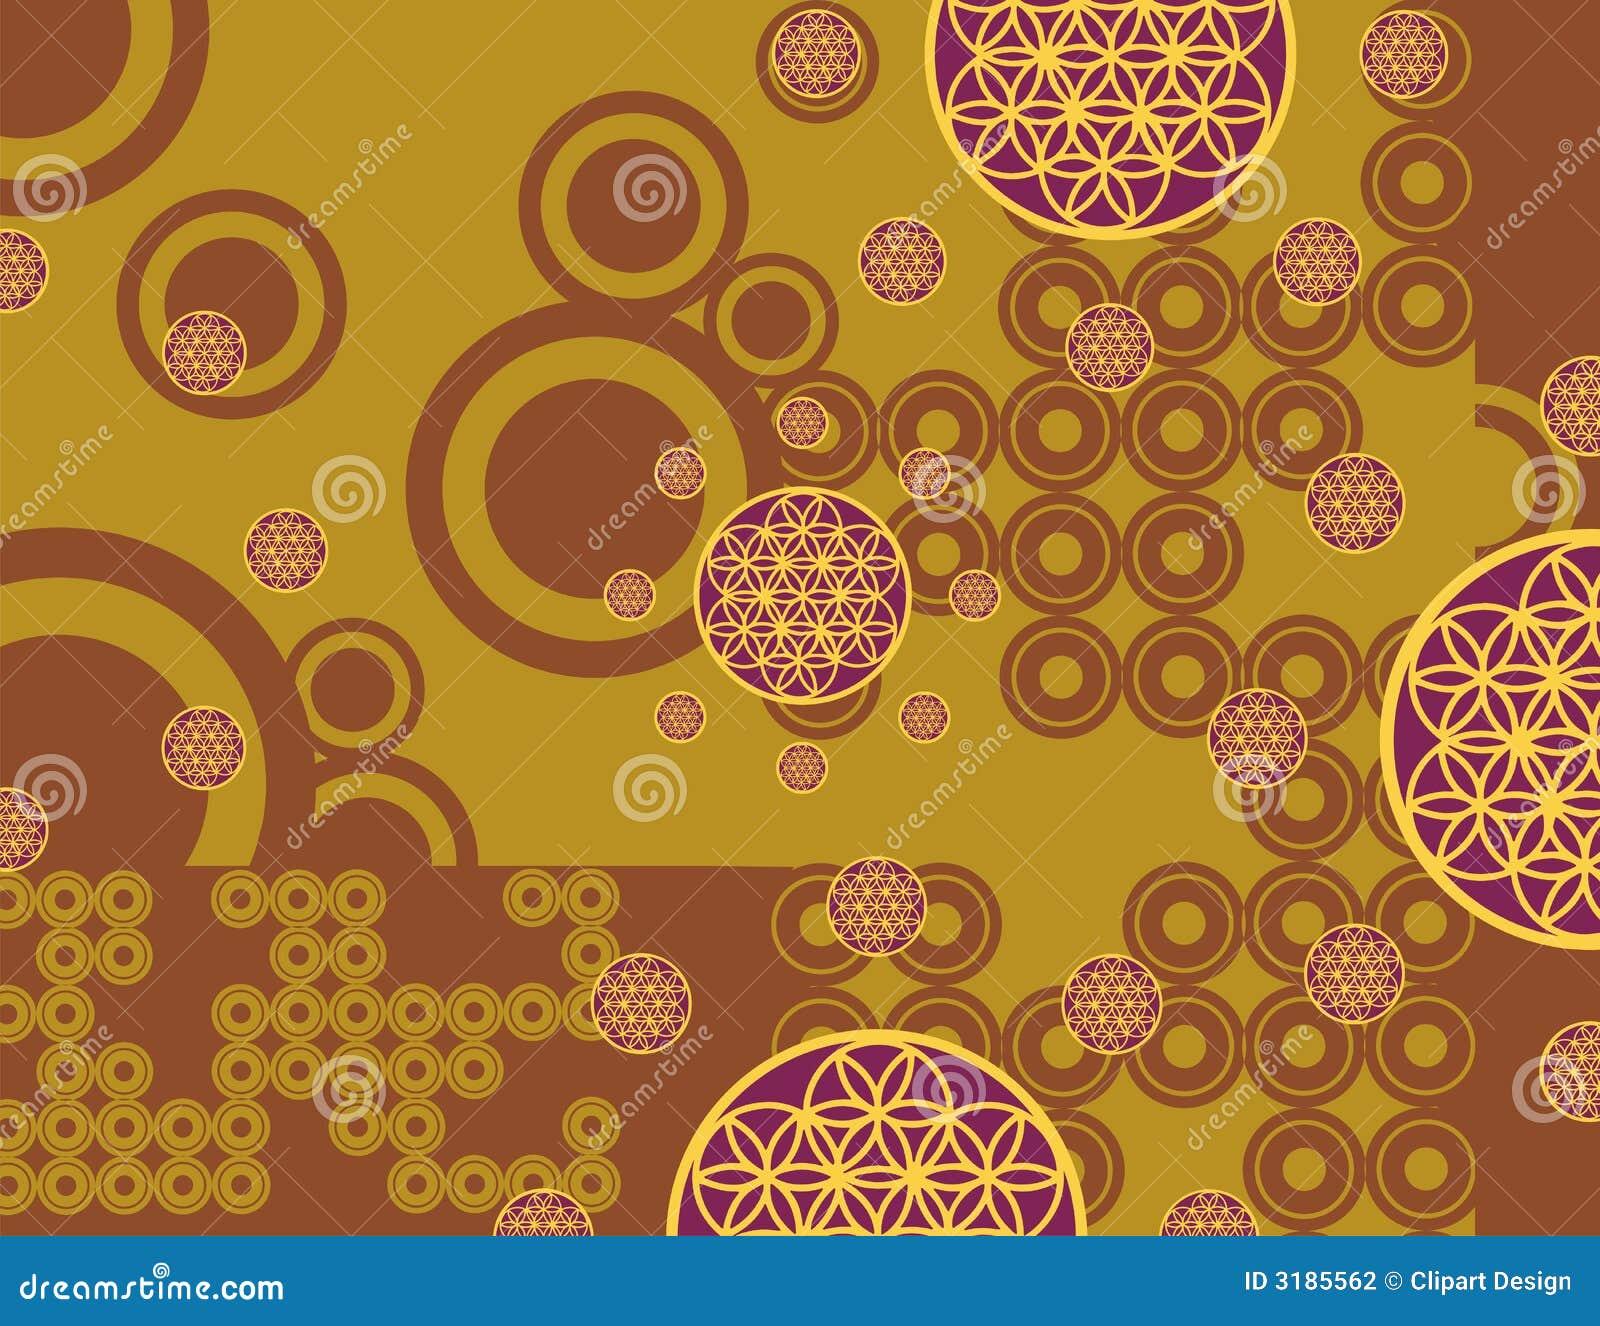 background vector arabian religious - photo #38